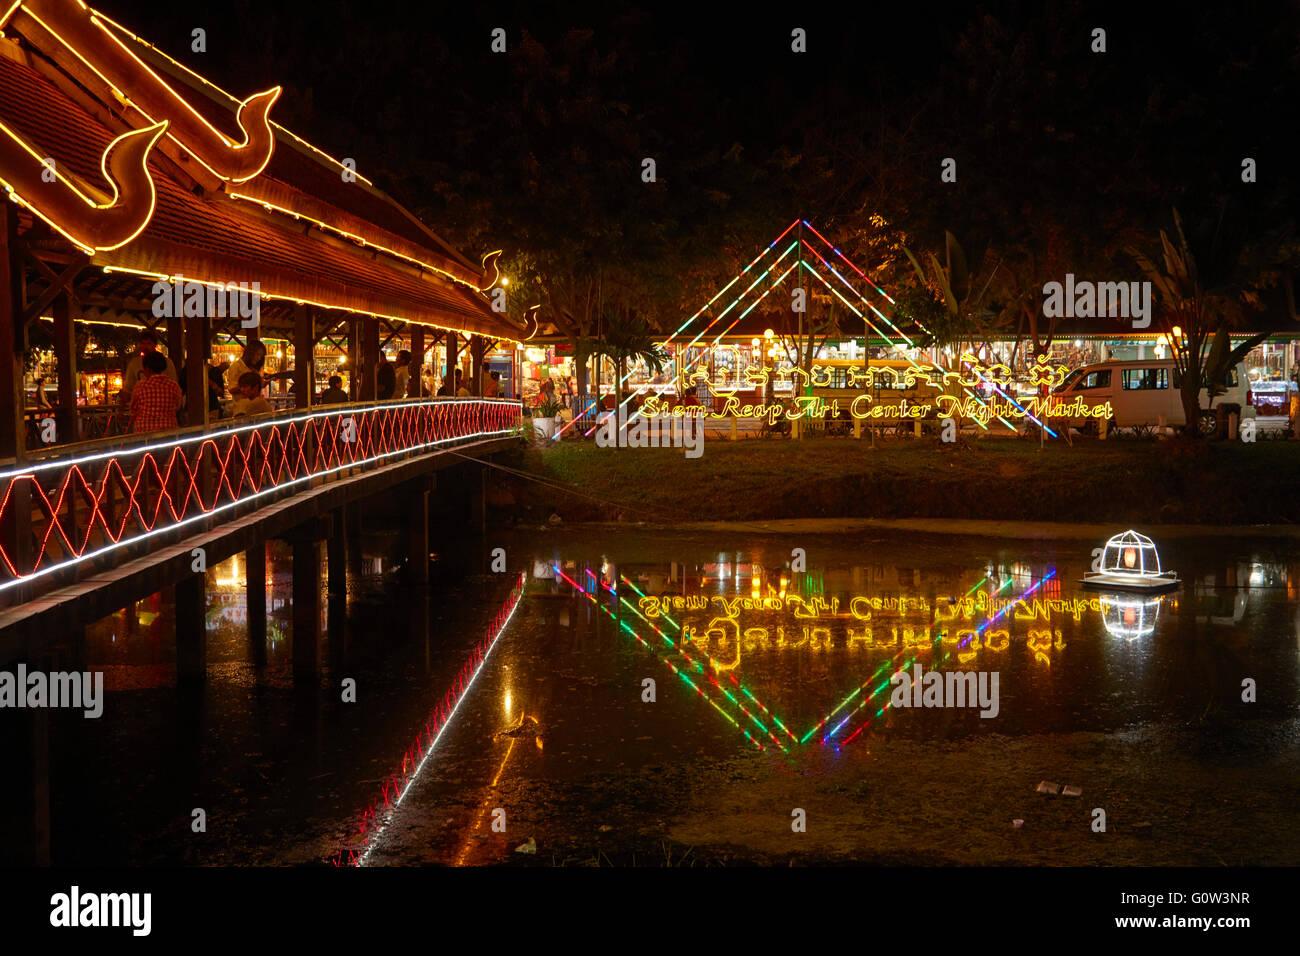 thailand footage at bangkok night videoblocks lights stock video blurred market wheel thumbnail background light